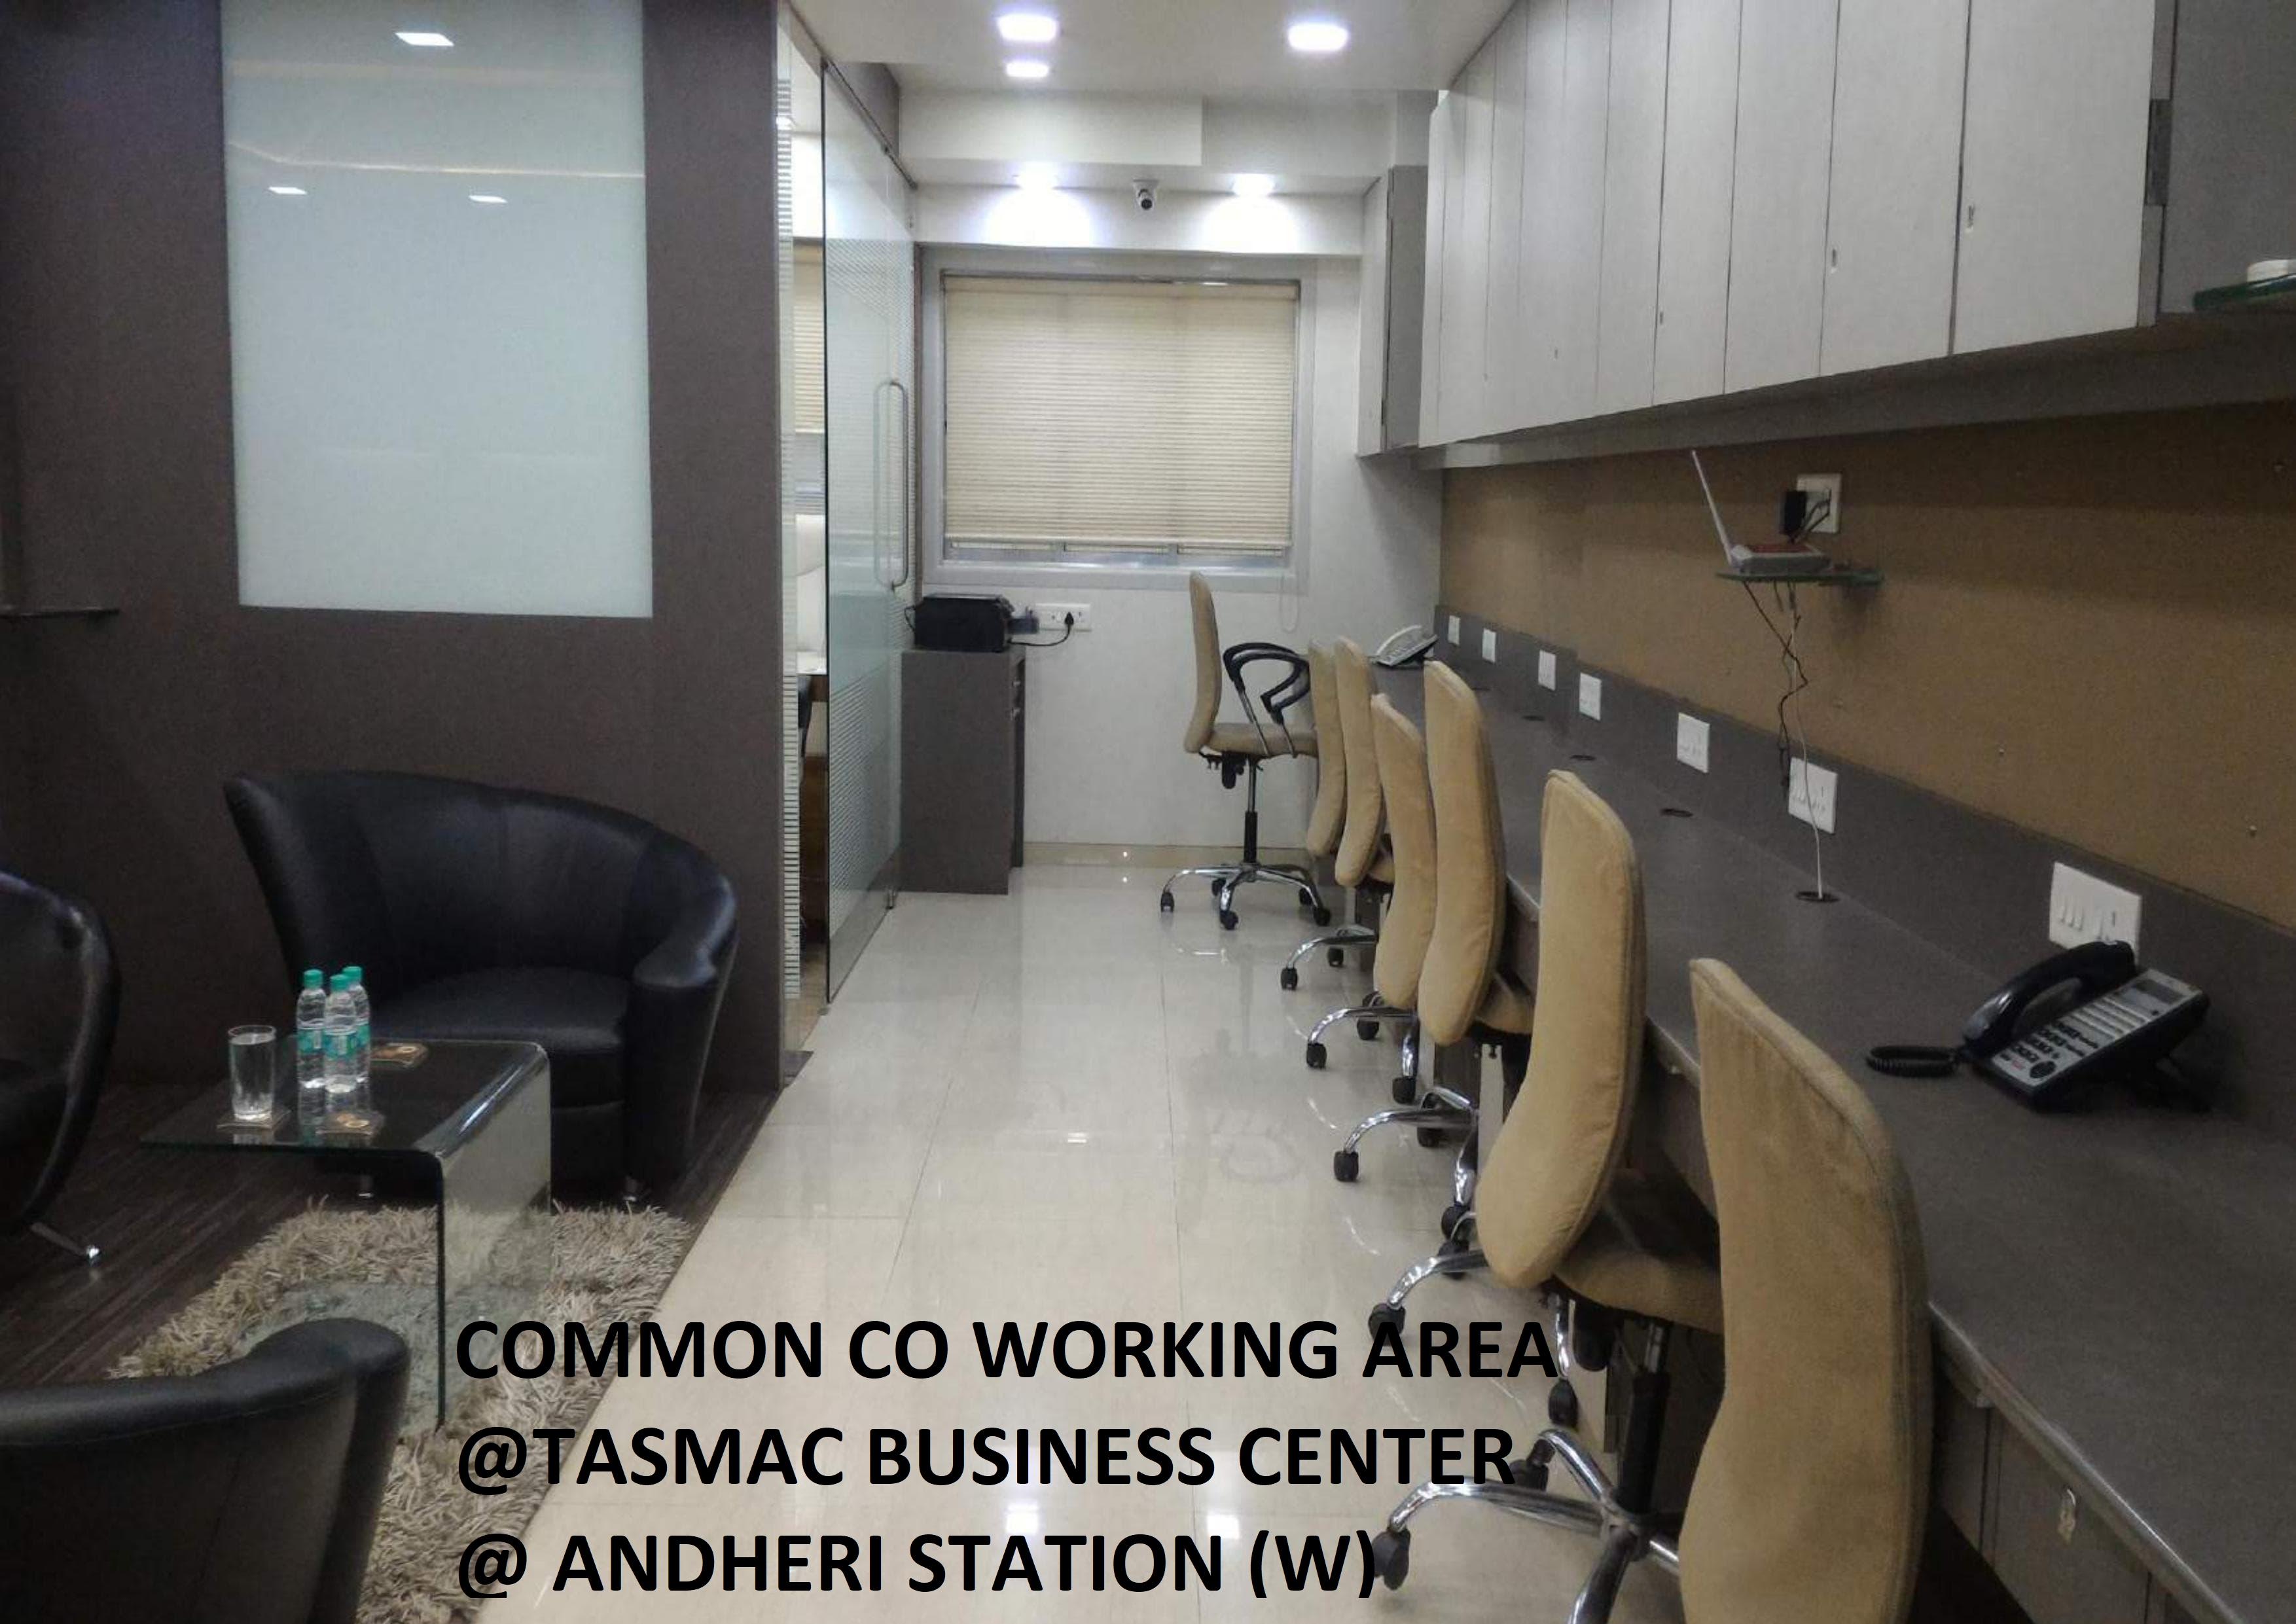 TASMAC BUSINESS CENTER, Mumbai